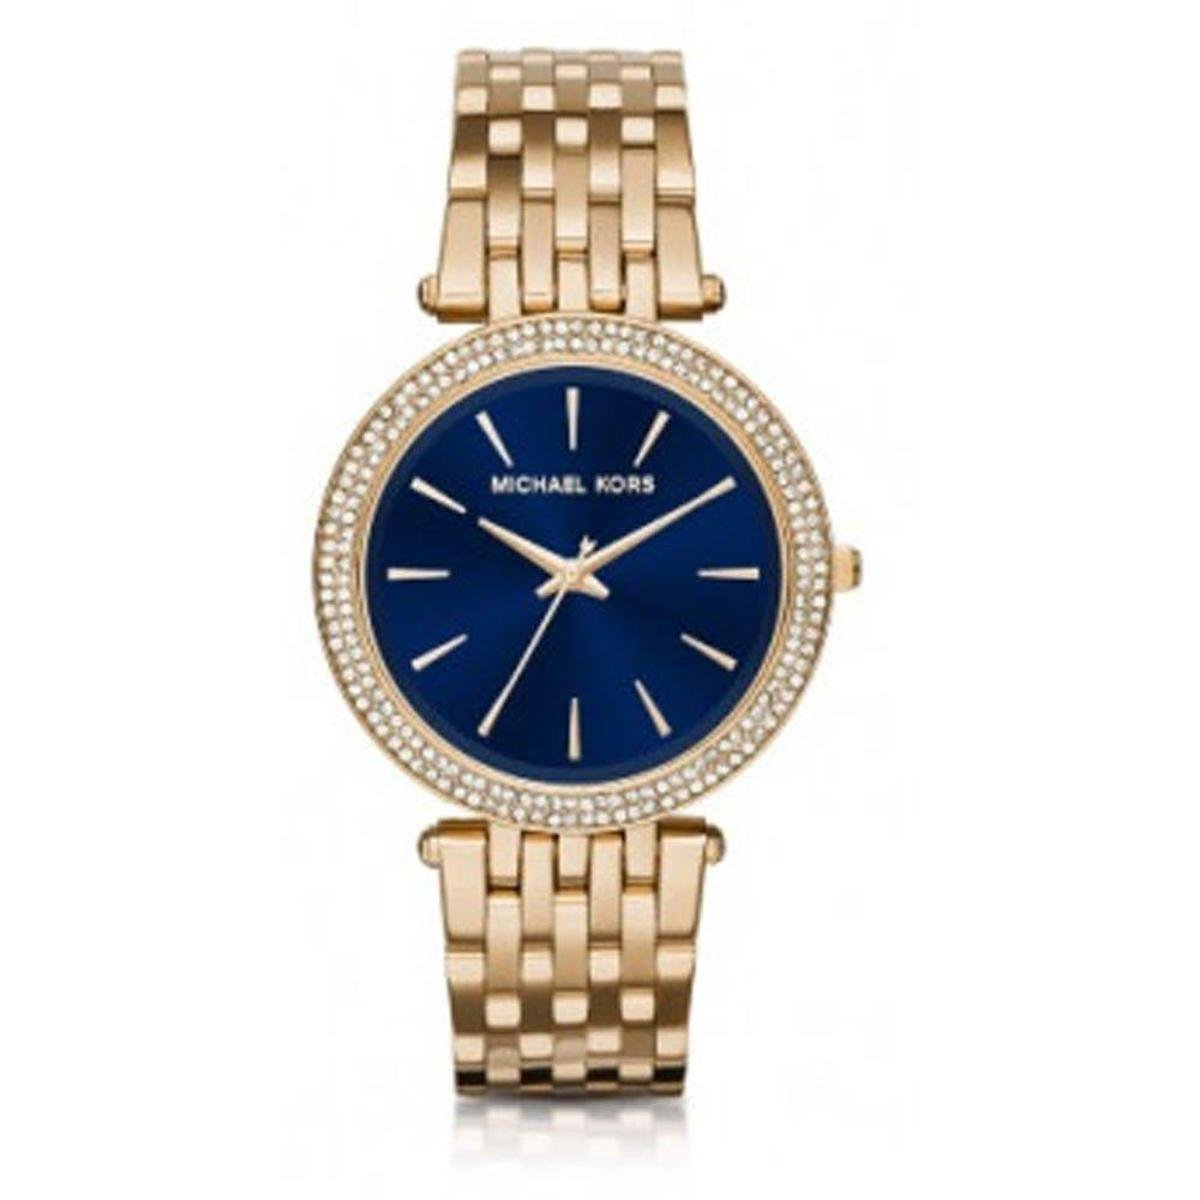 896c98393b6 Relógio Michael Kors Feminino Analógico - Compre Agora